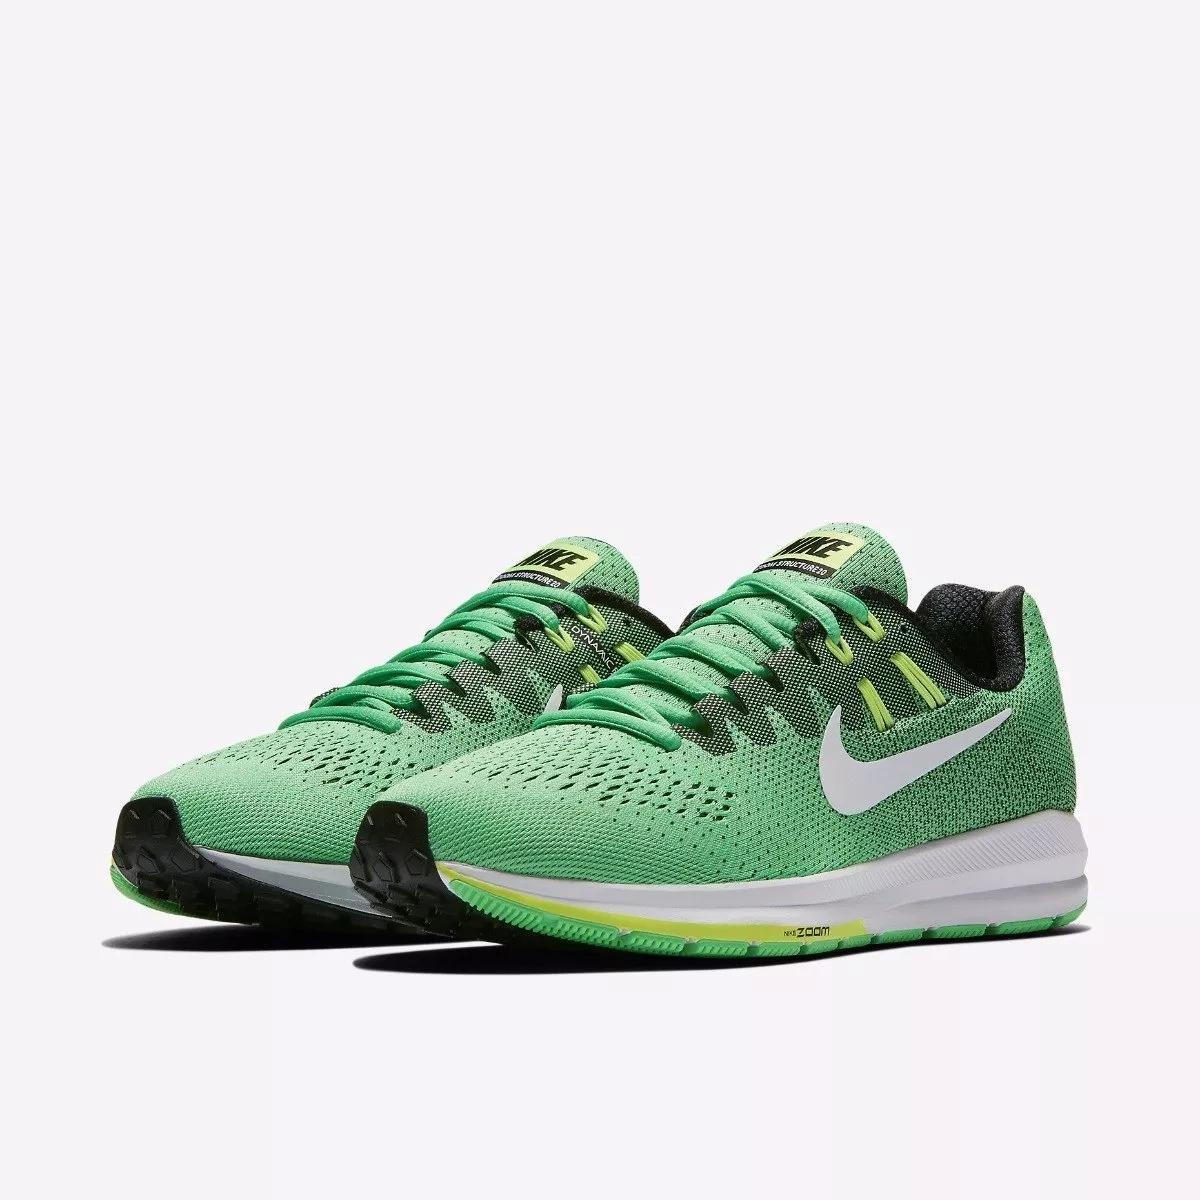 a5e7364ebe178 Zapatillas Nike Air Zoom Structure 20 - Talle 42.5 (9 Usa) -   2.900 ...